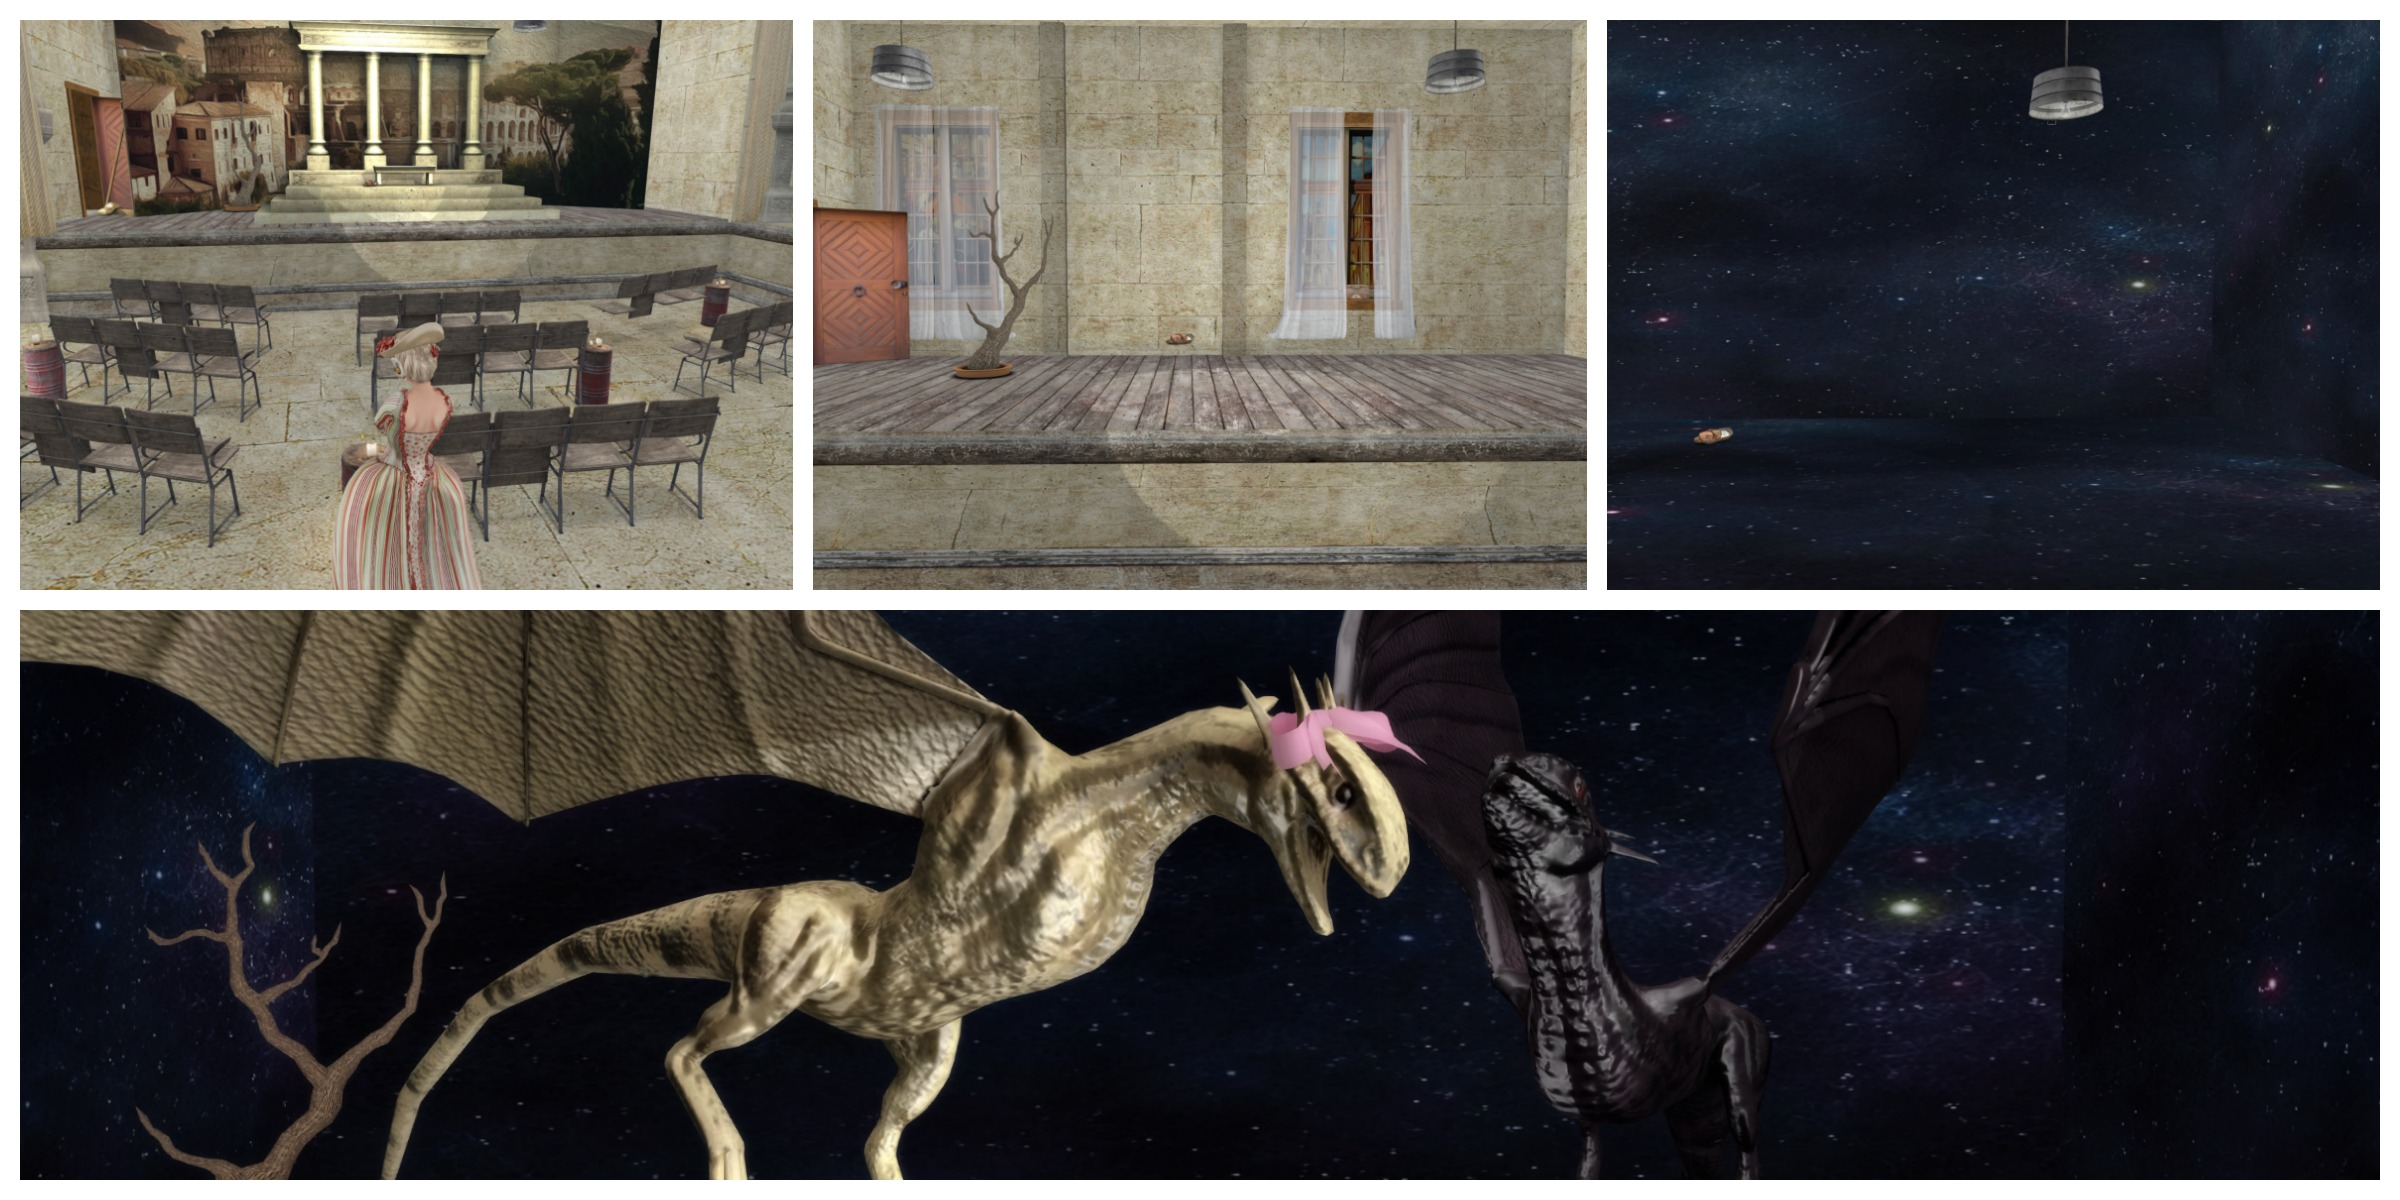 Dandelion & Kearns Bühnenaufbau